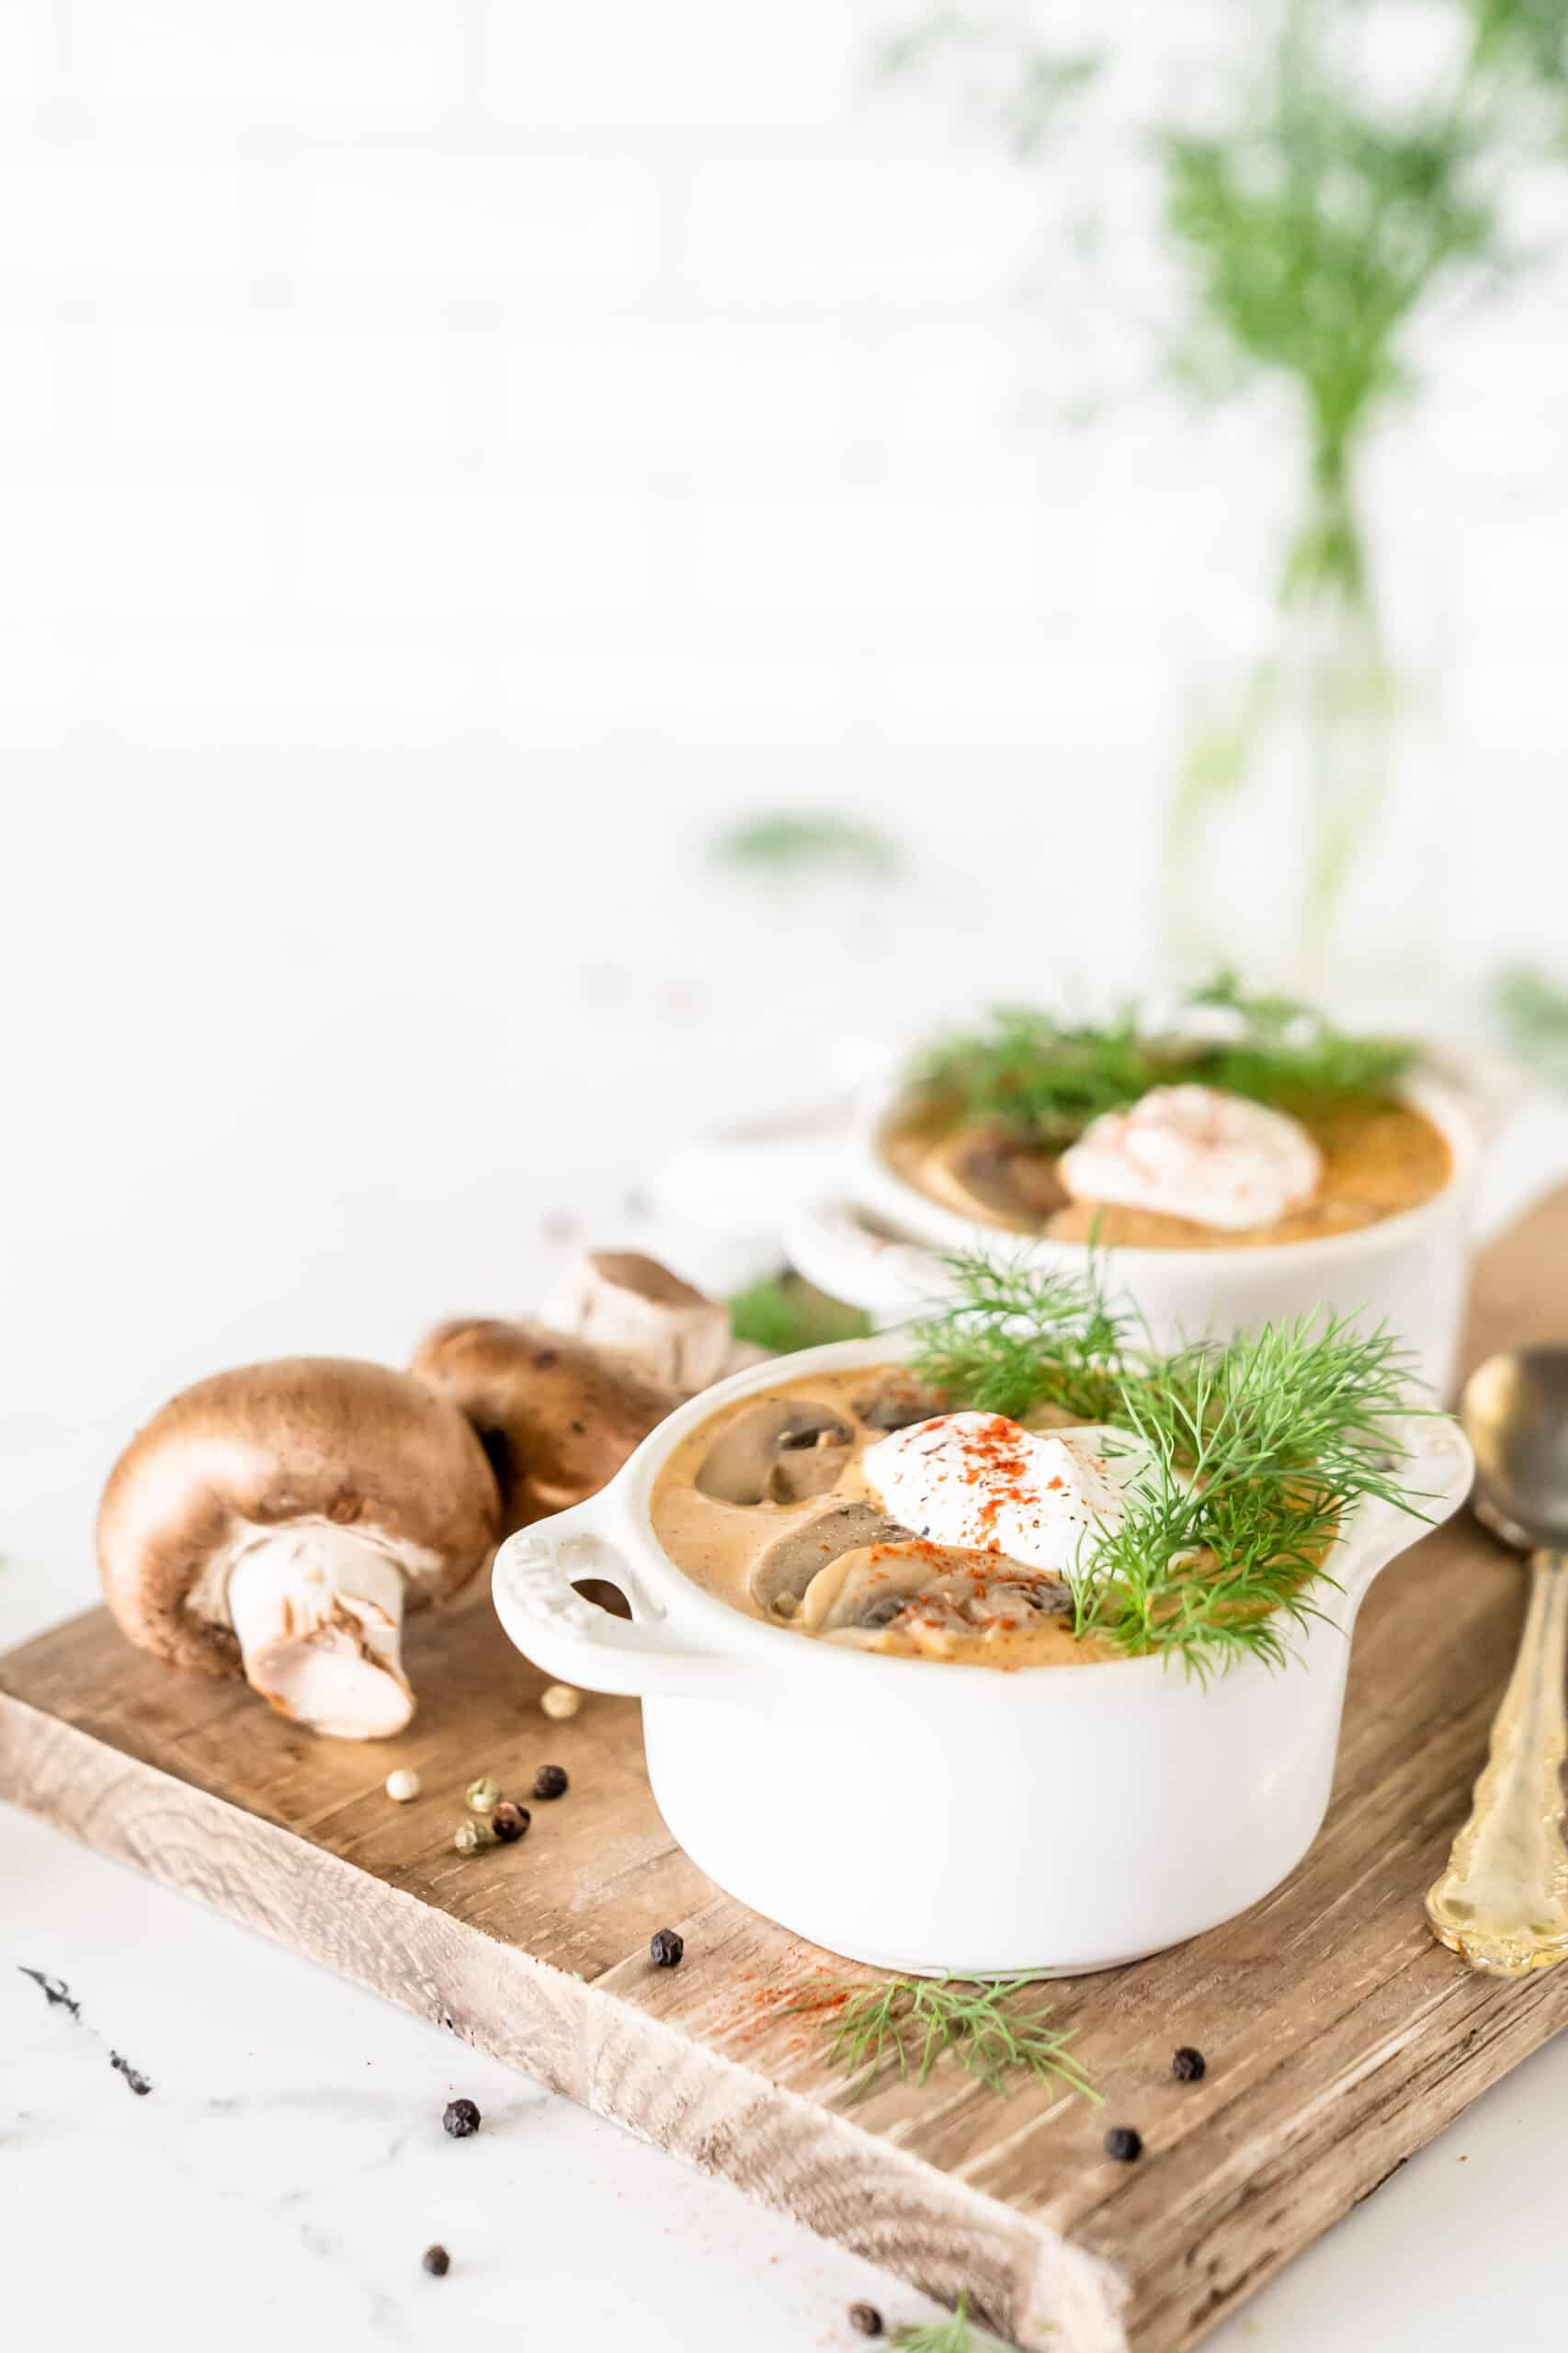 le creuset ramekins filled with rustic Hungarian mushroom soup